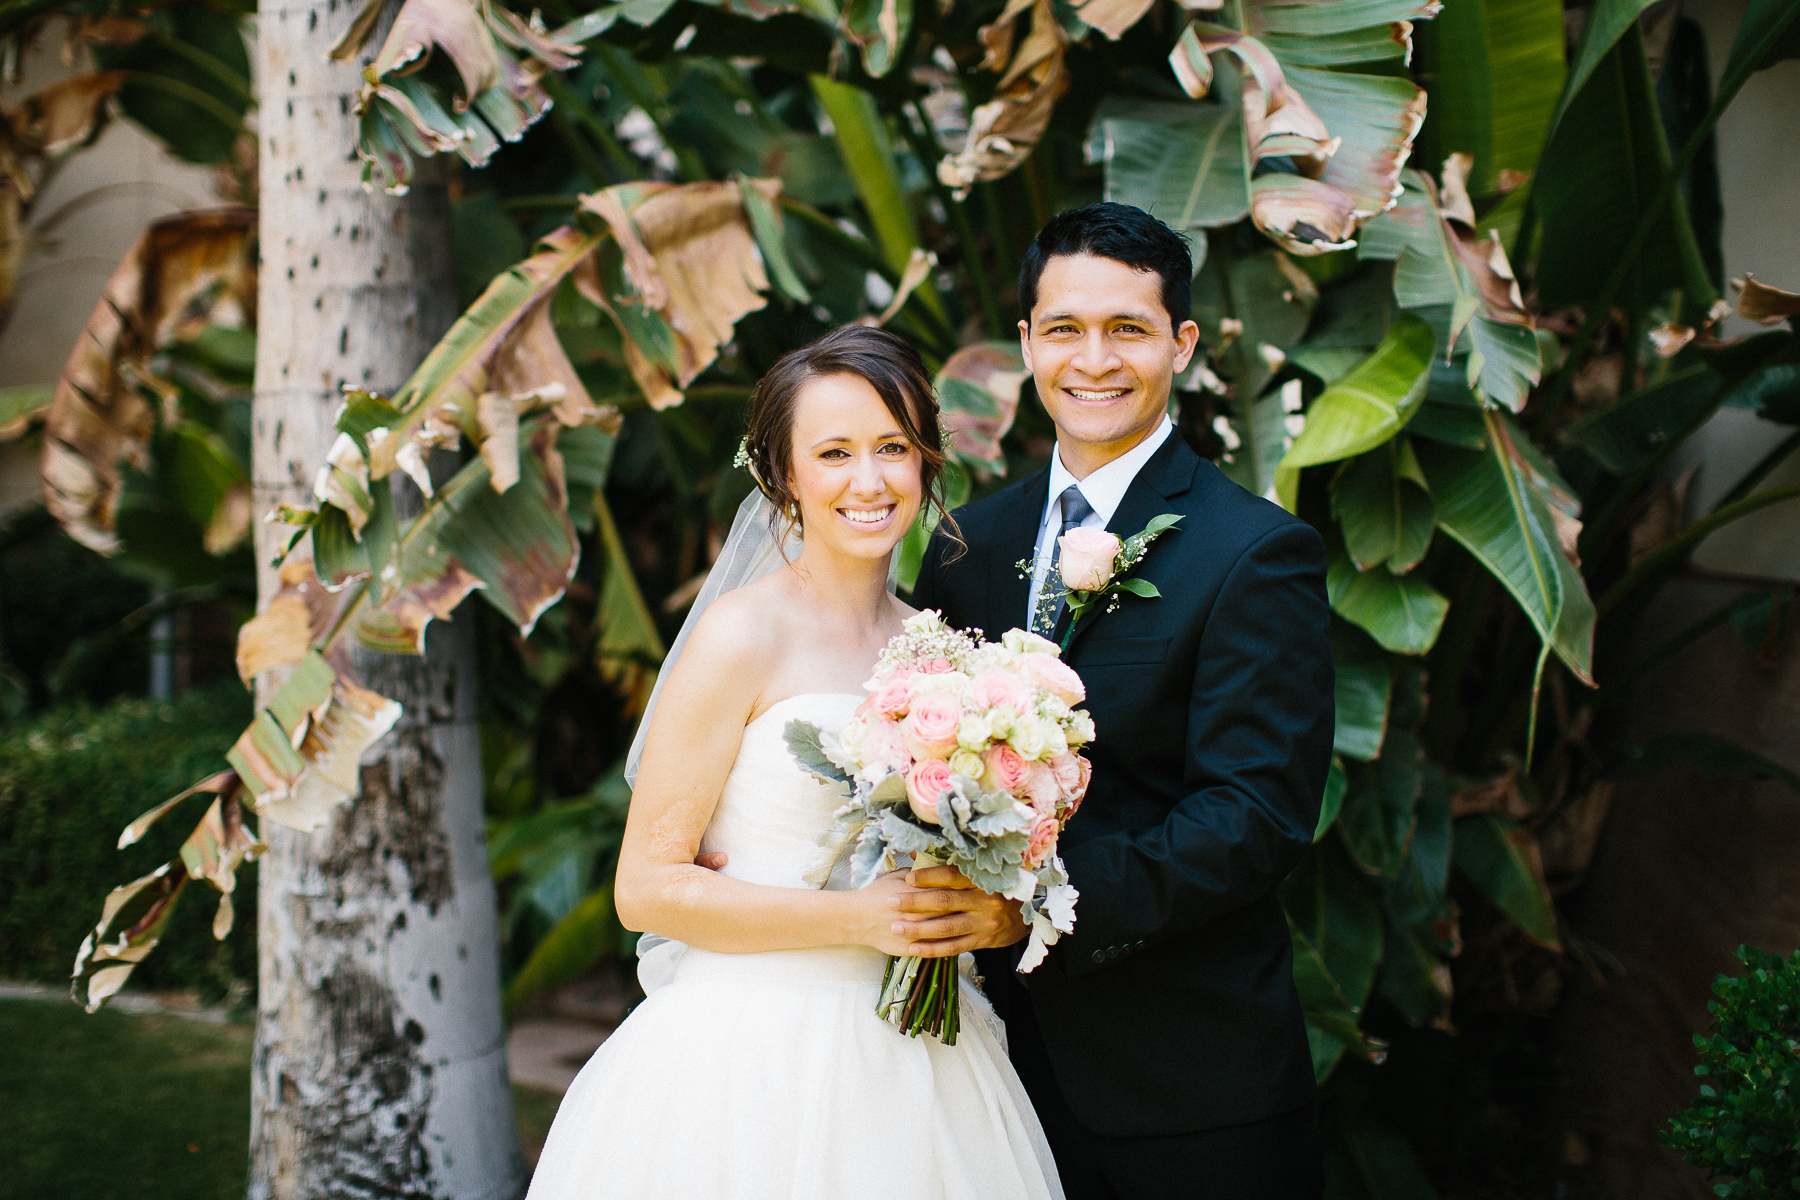 170708-Luxium-Weddings-Arizona-Sheraton-Phoenix-Arizona-Photographer-Hilton-Hawaiian-1011.jpg